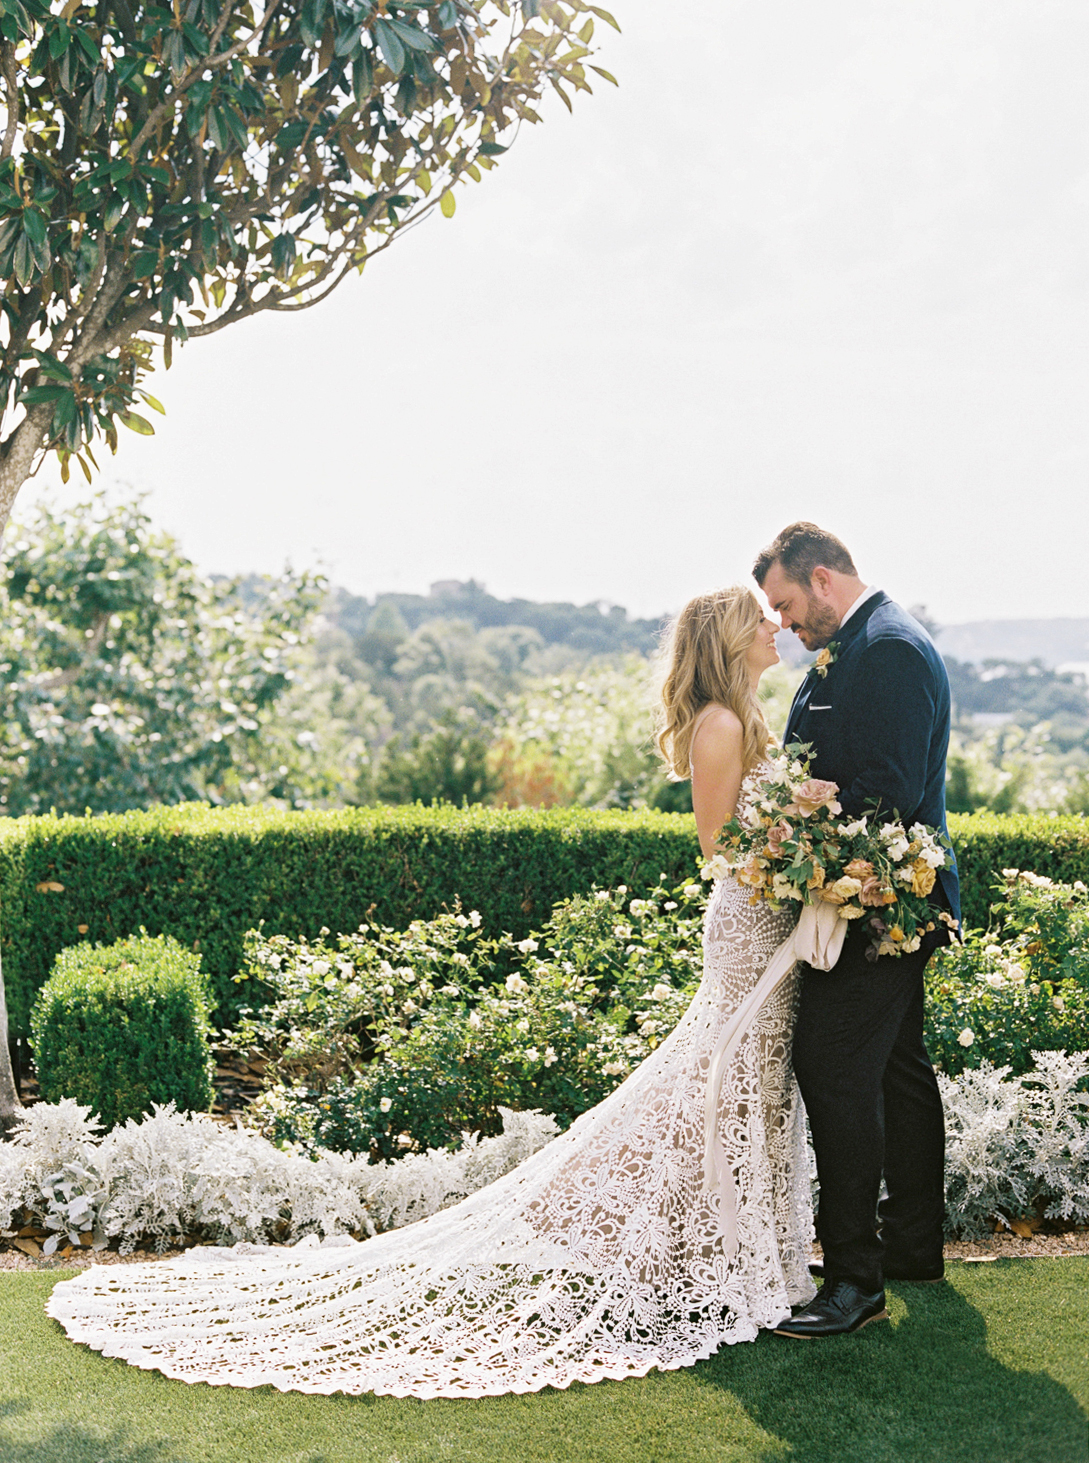 charla jesse wedding couple outdoors